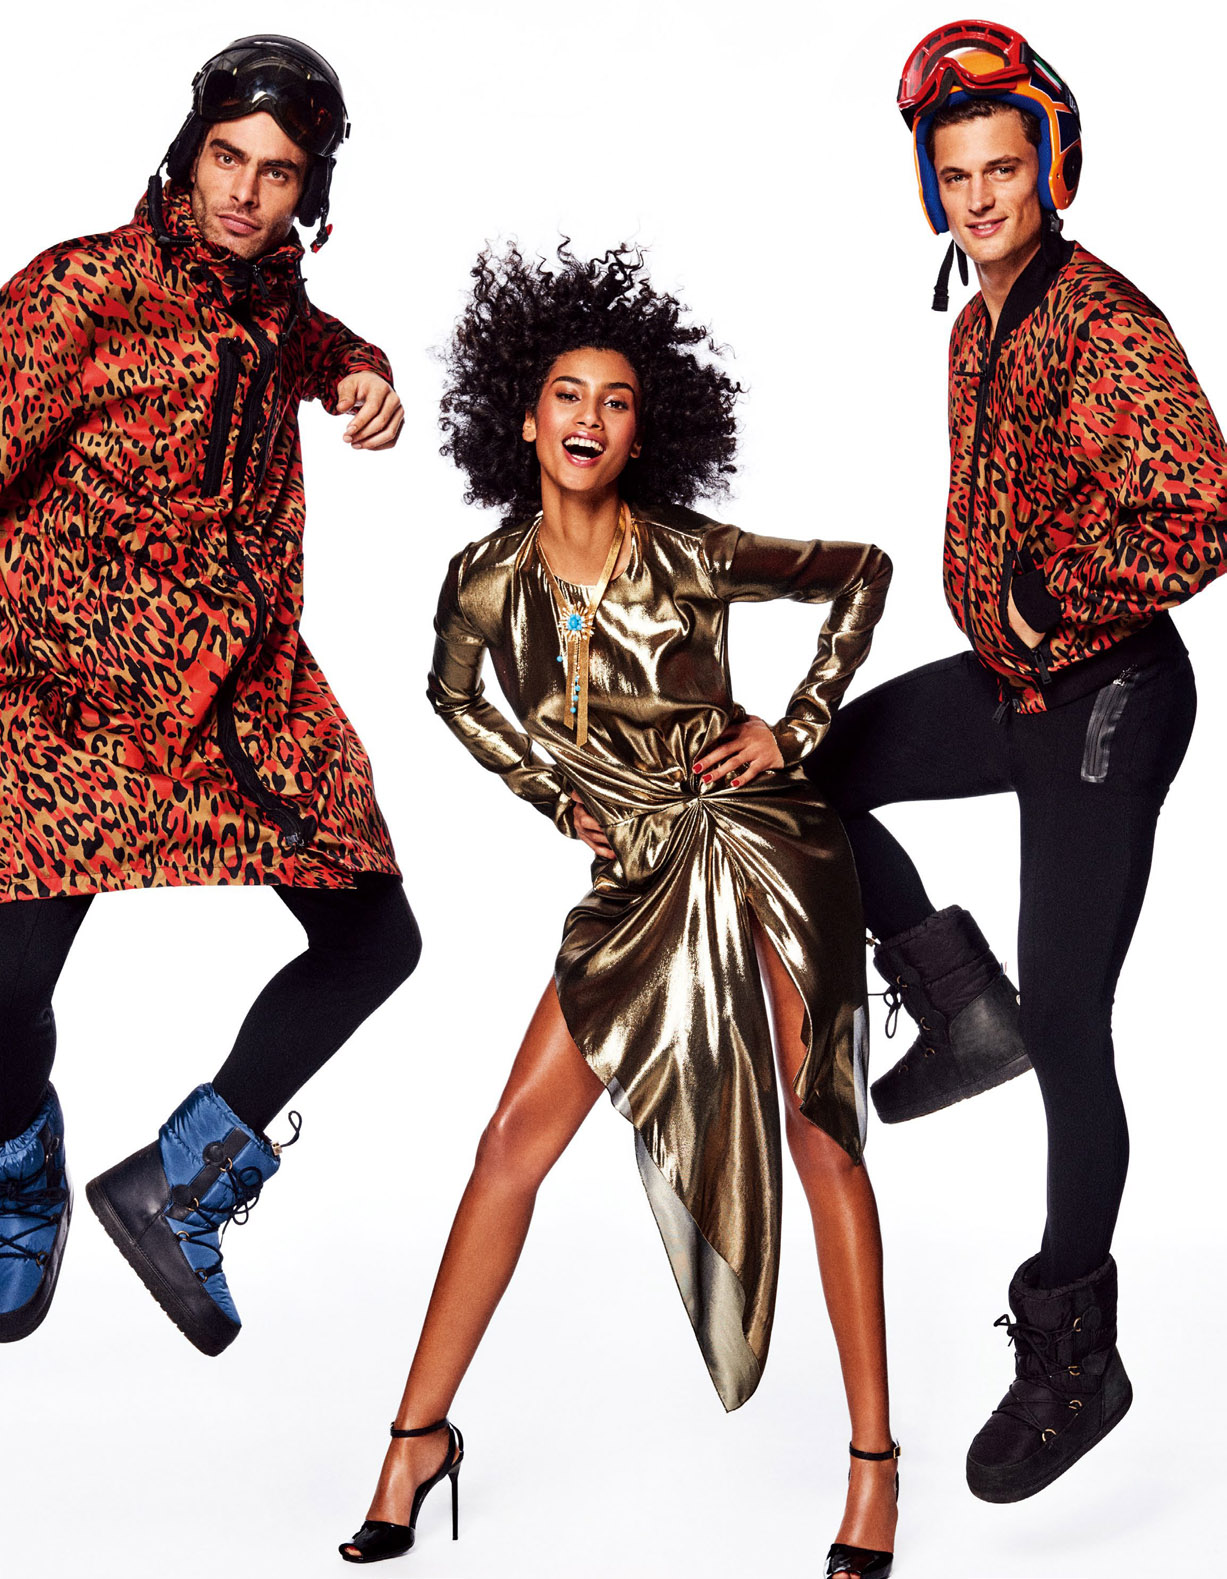 спортивная и гламурная Имаан Хаммам / Imaan Hammam, Garrett Neff, Jon Kortajarena by Giampaolo Sgura - Vogue Japan May 2017